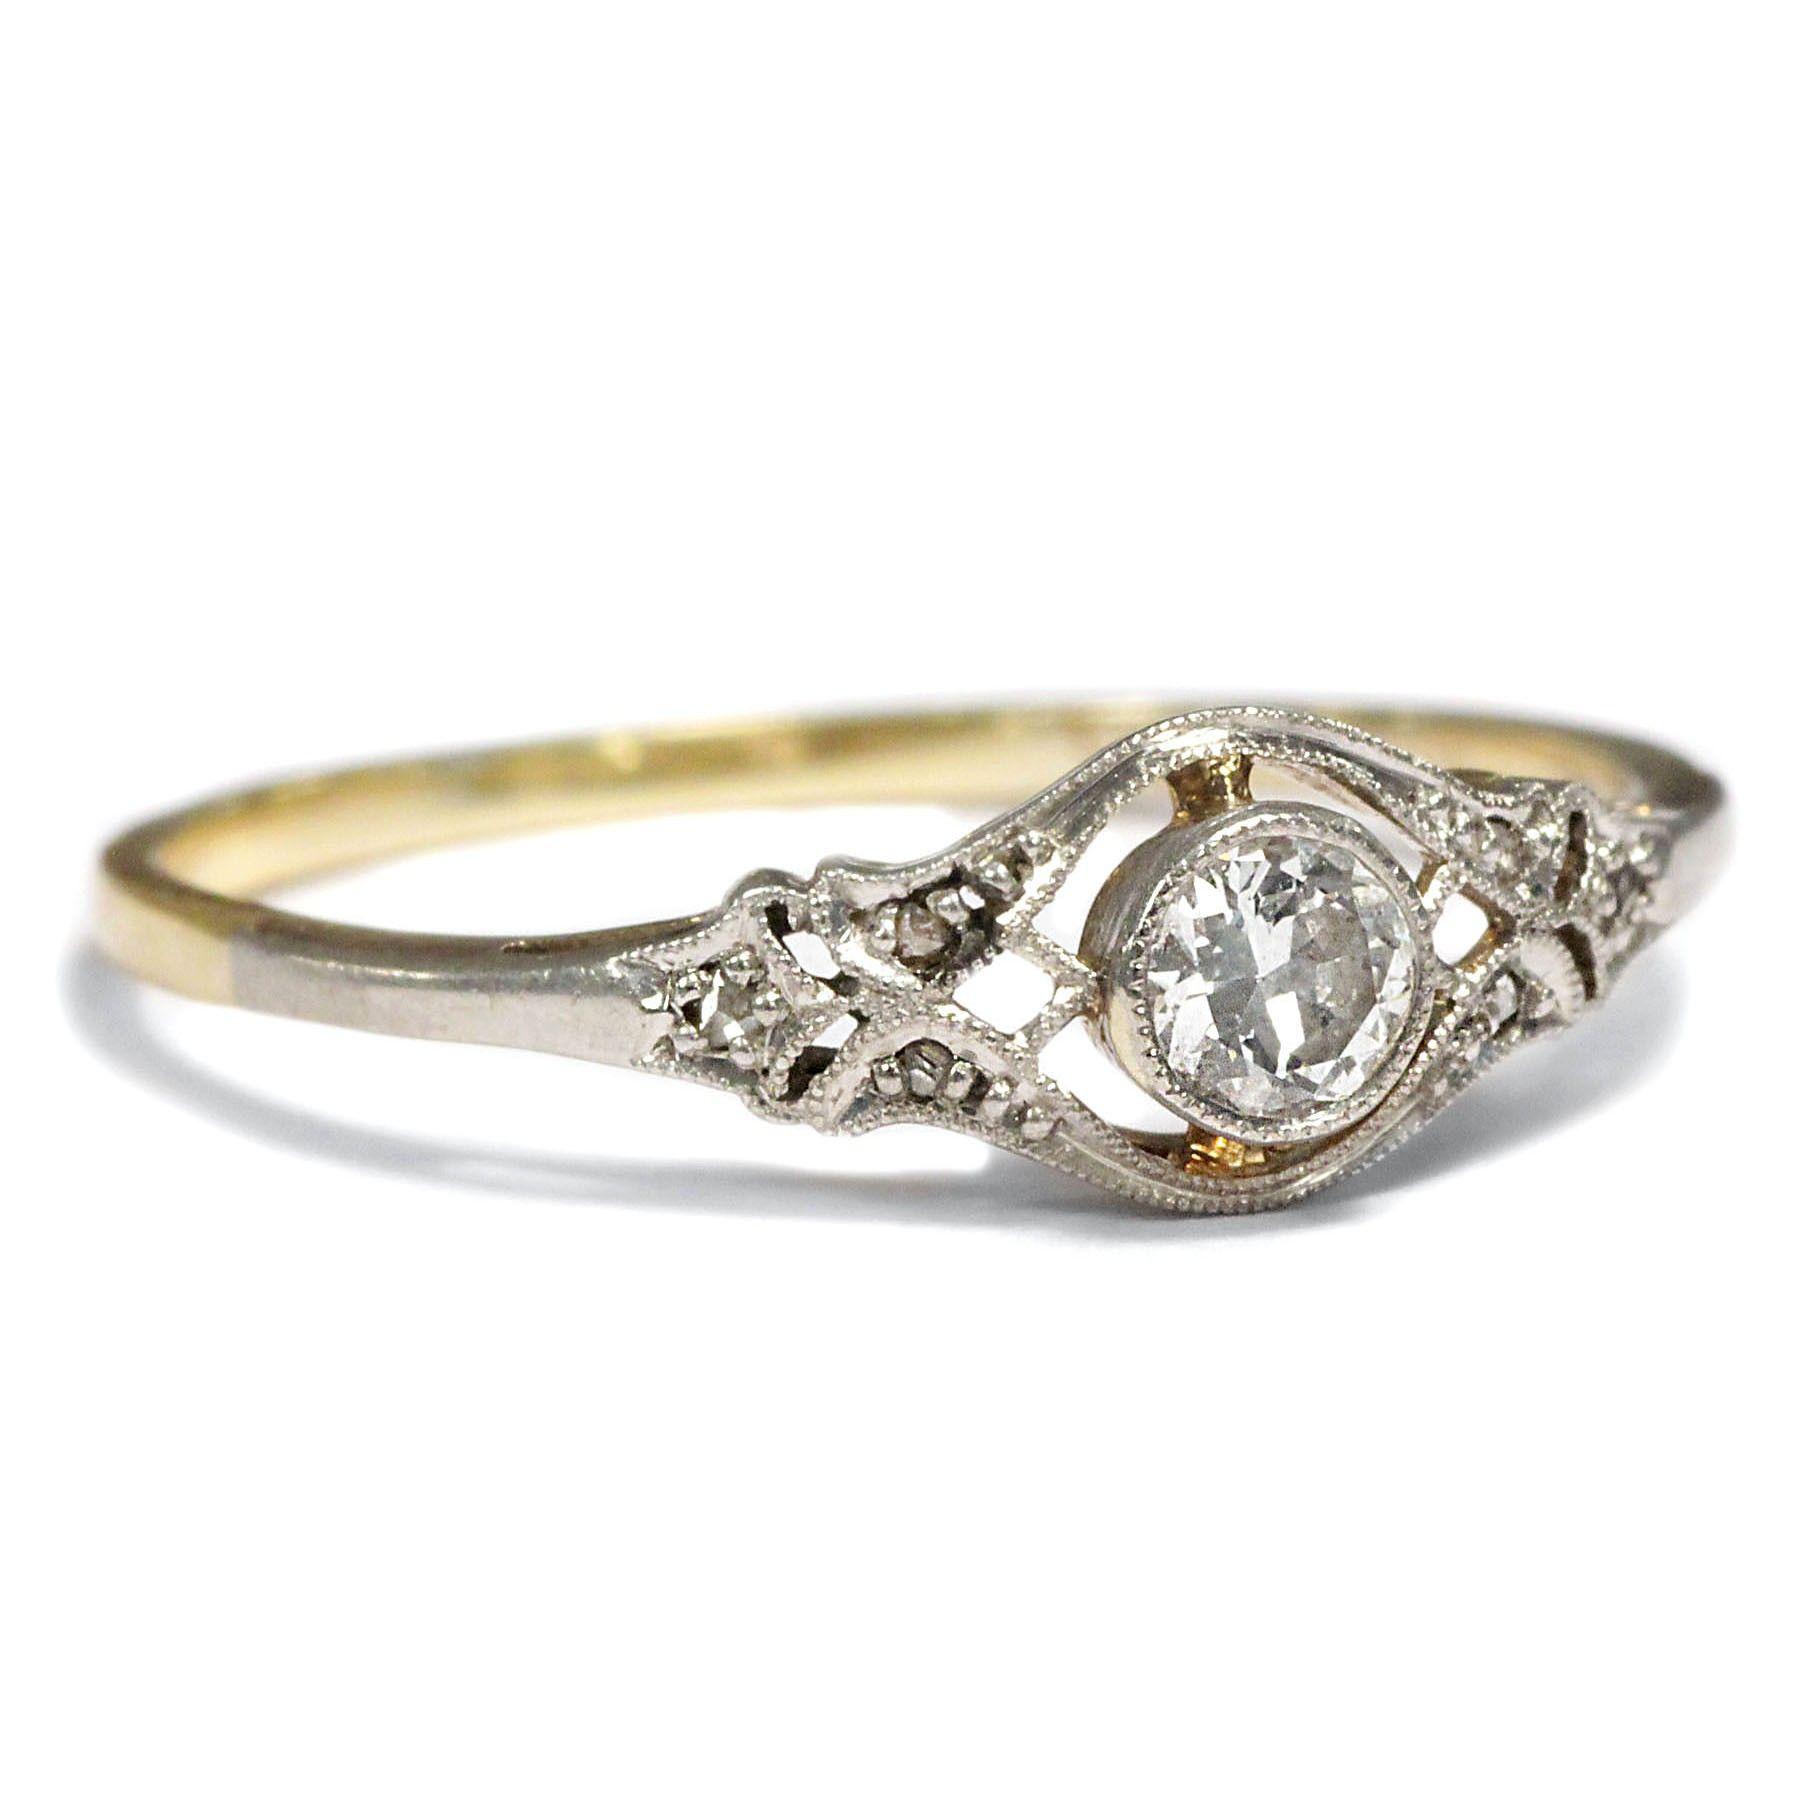 Ein Lieblingsstück - Antiker Verlobungsring DIAMANT RING, Jugendstil ...